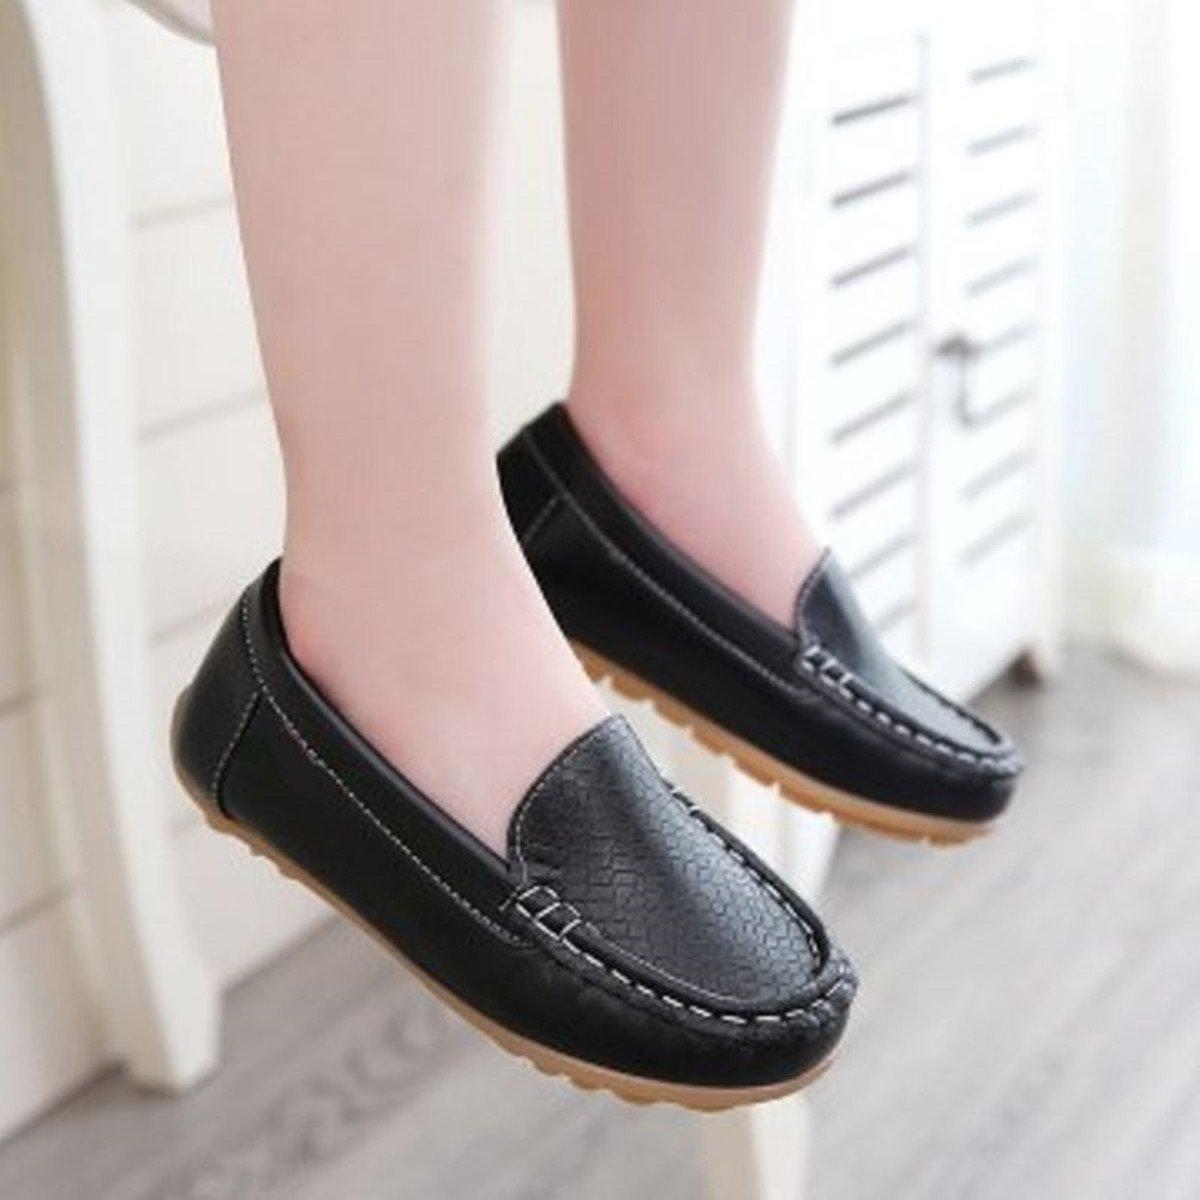 Sakuracan Boys Girls Leather Loafers Slip-on Boat Dress-Shoes (Toddler/Little Kid) by Sakuracan (Image #2)